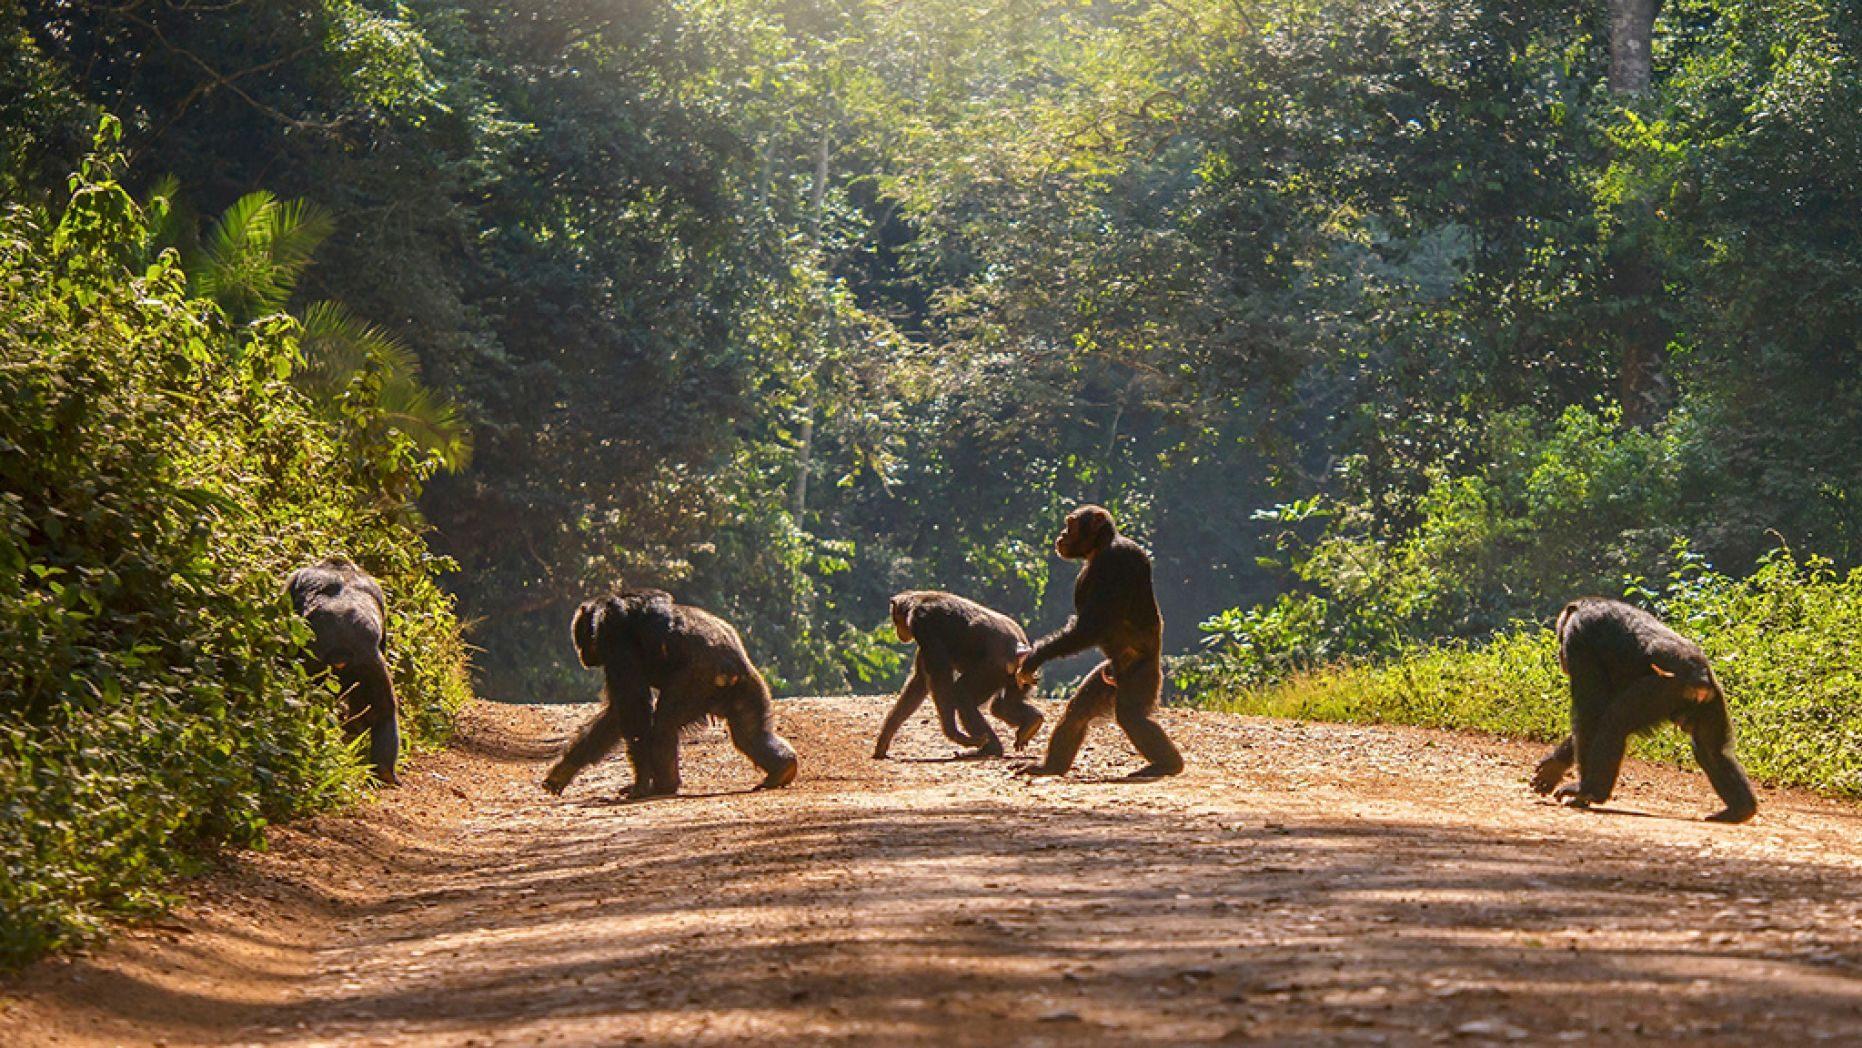 chimp-2-iStock.jpg